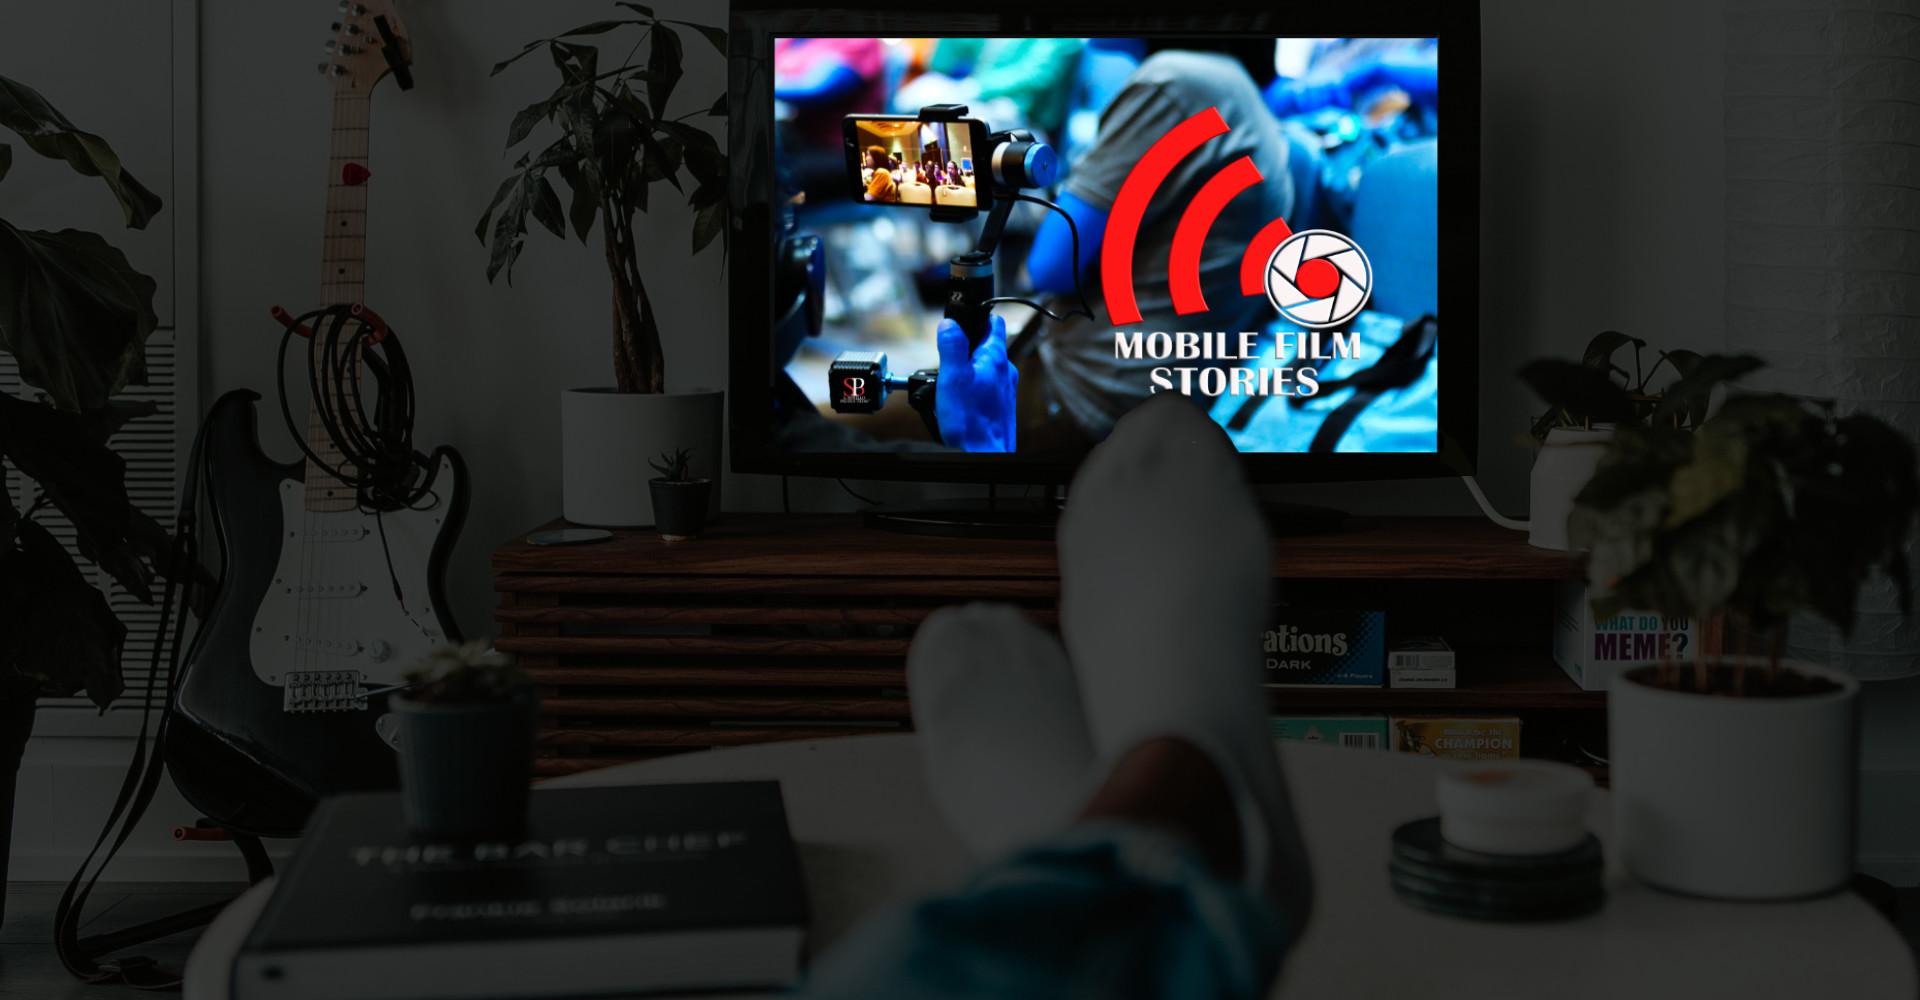 Watching Mobile Film Stories